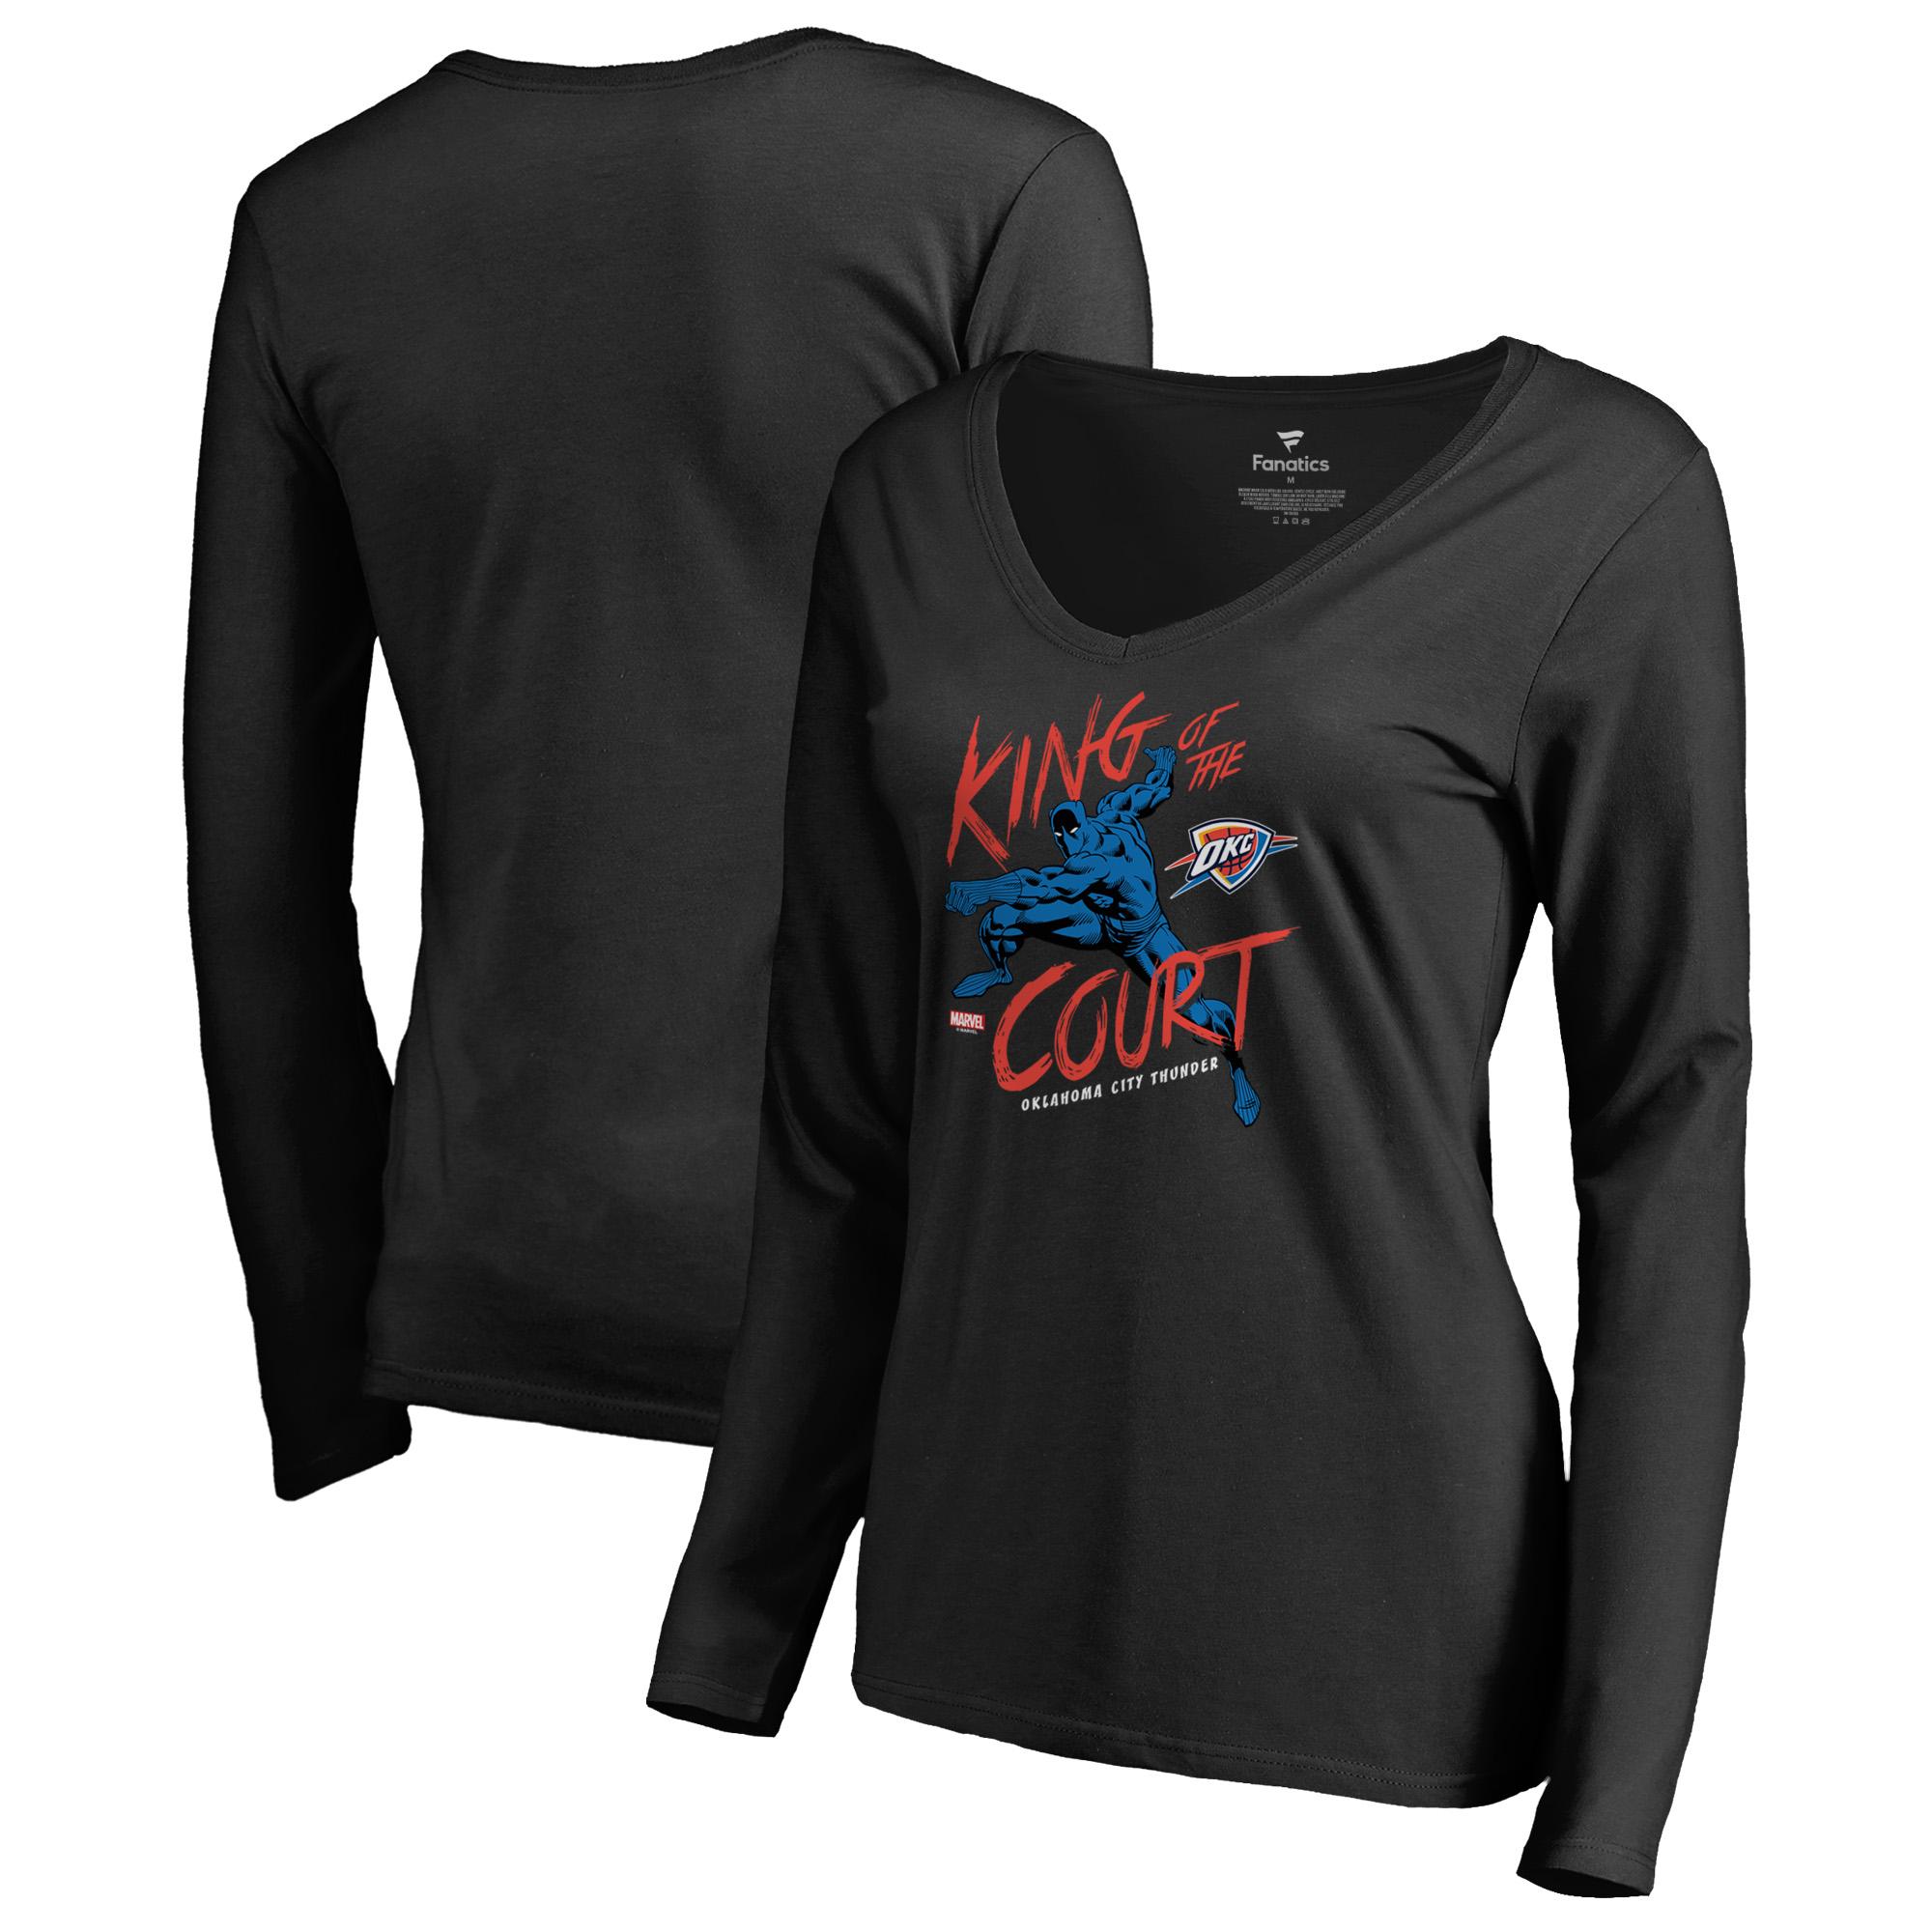 Oklahoma City Thunder Fanatics Branded Women's Marvel Black Panther King of the Court Long Sleeve V-Neck T-Shirt - Black